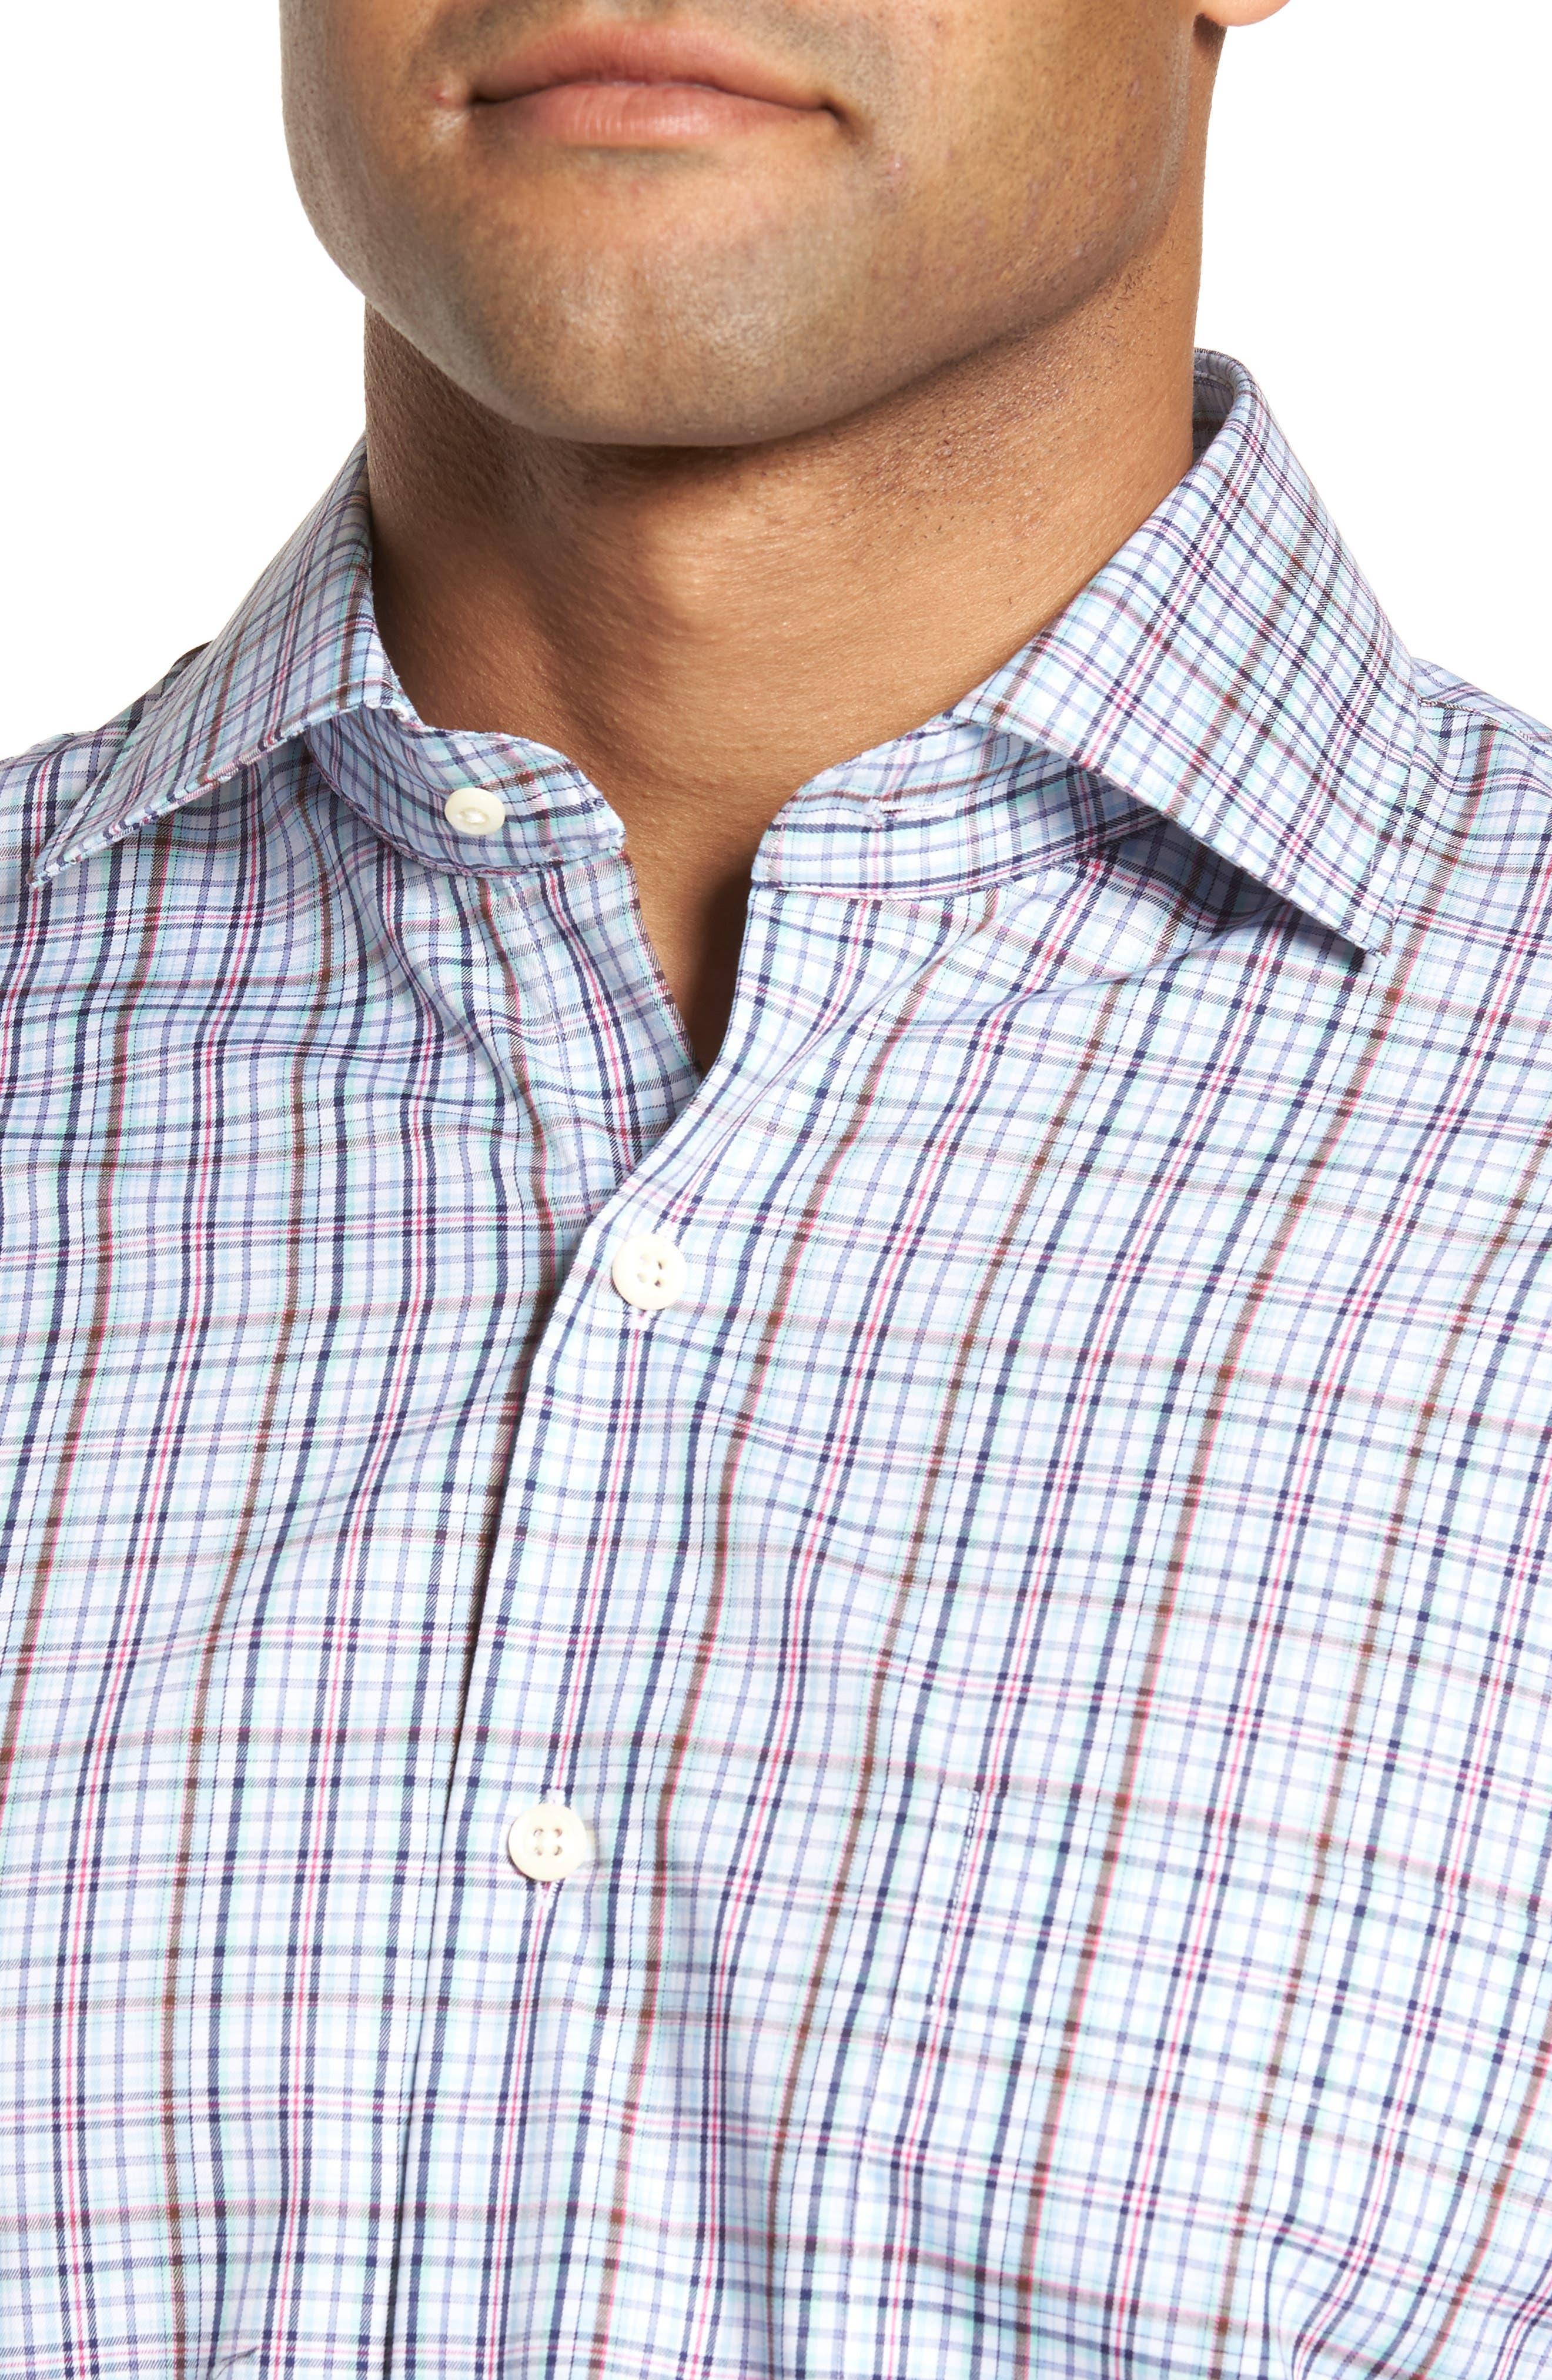 Crown Ease Tango Pinwheel Regular Fit Sport Shirt,                             Alternate thumbnail 4, color,                             453